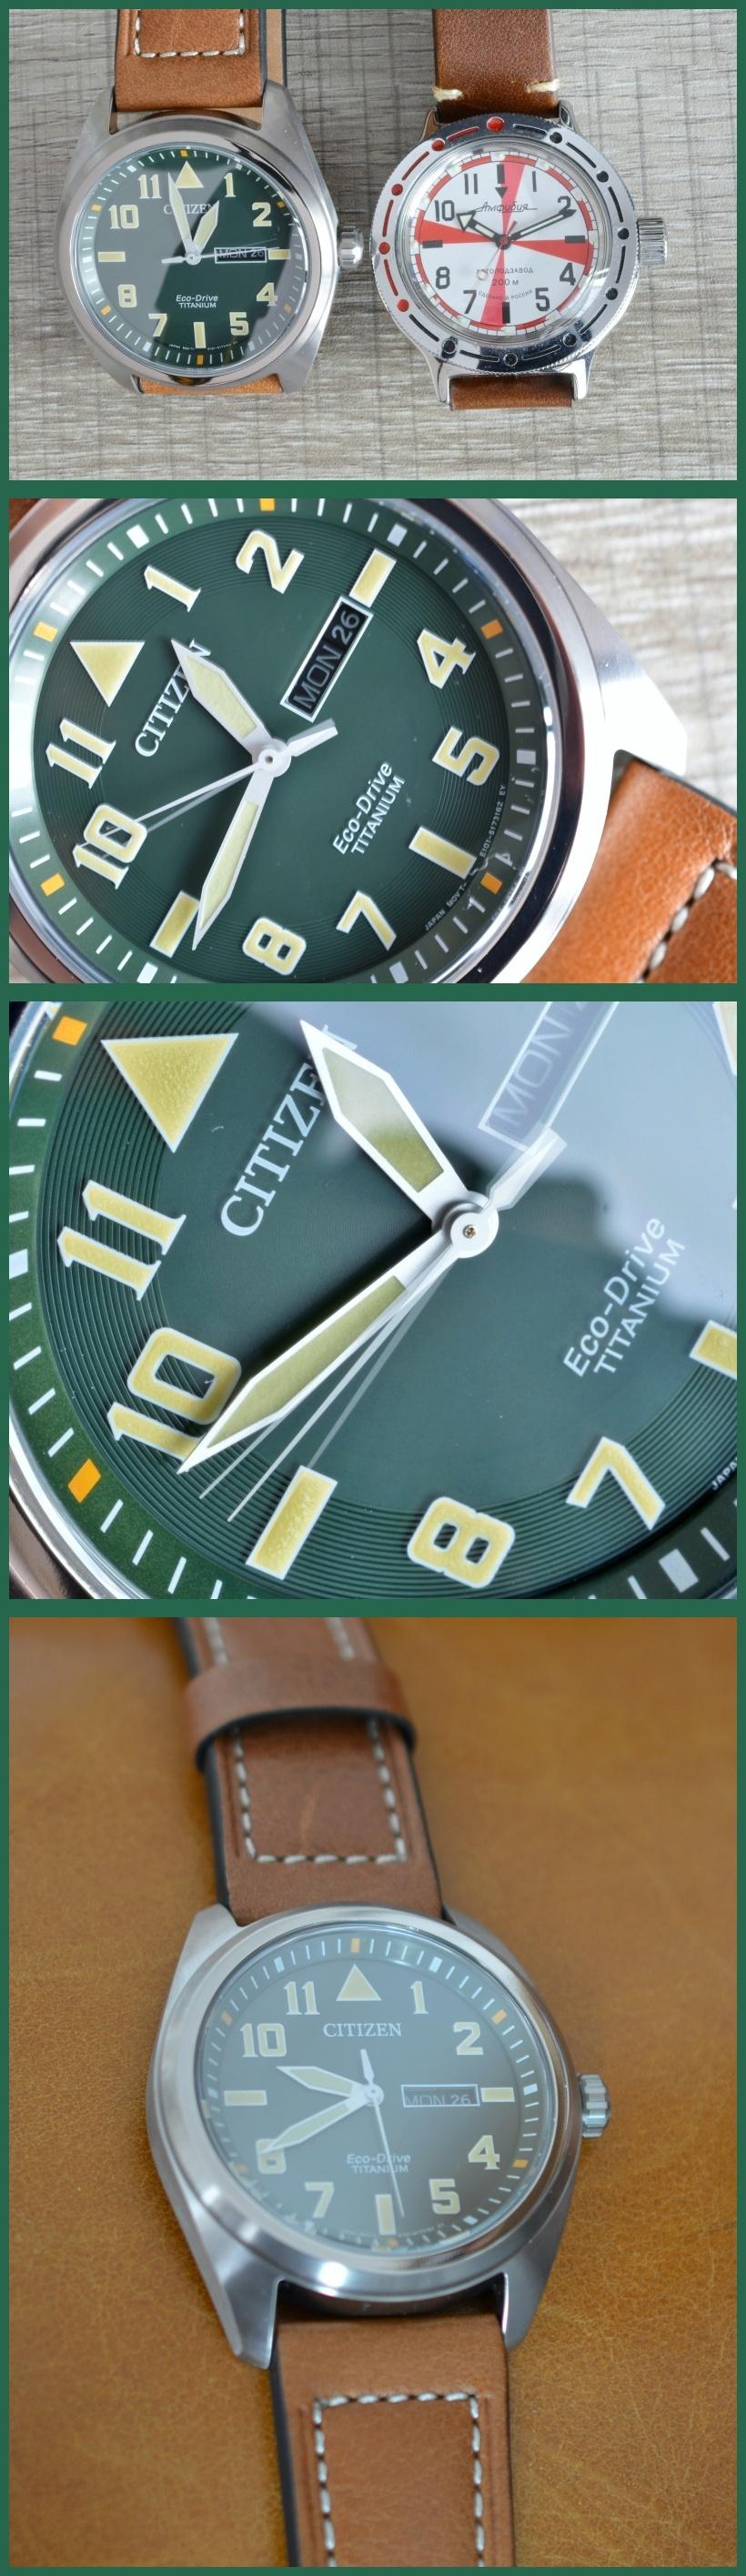 [Revue] Citizen BM8560-11X Super Titanium™ & Quartz Eco-drive™ Autres10